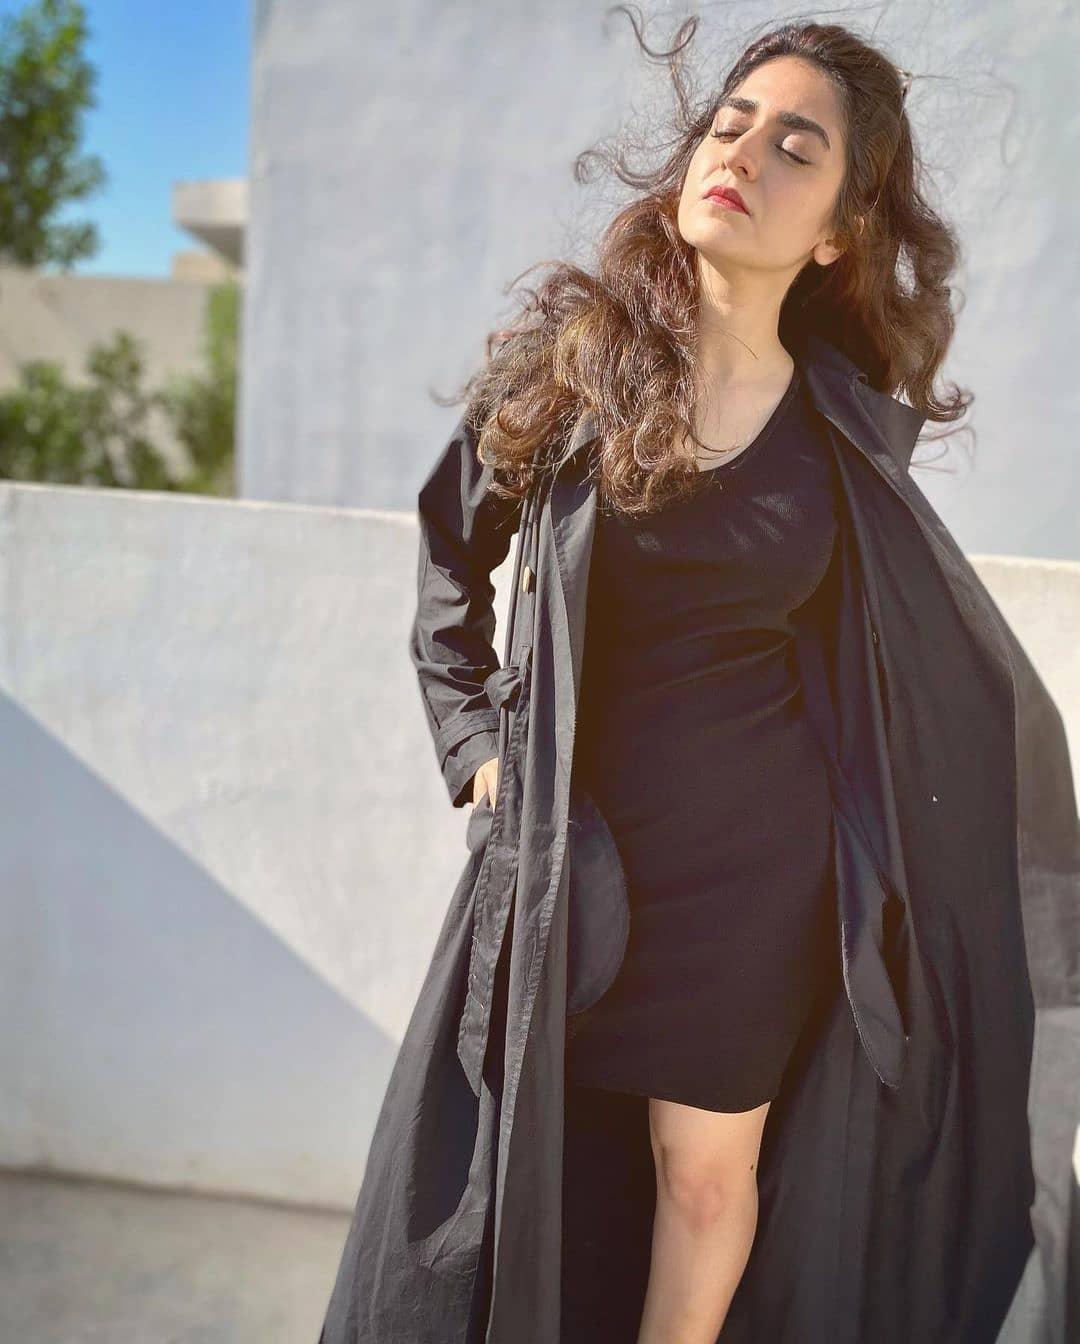 Most Criticized Recent Photos of Pakistani Celebrities